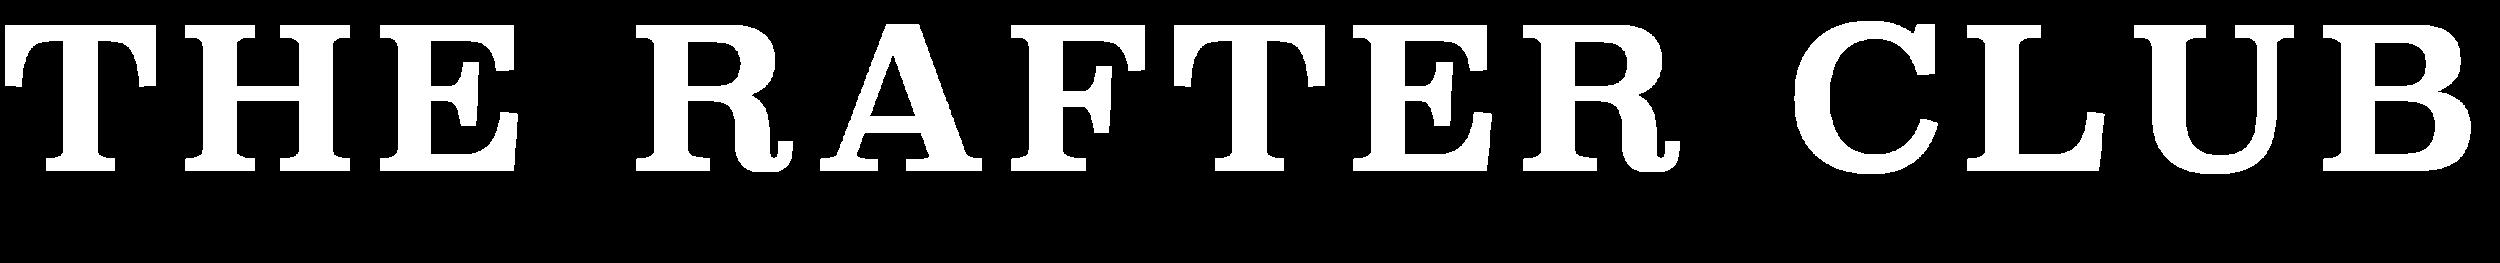 Typemark A.png